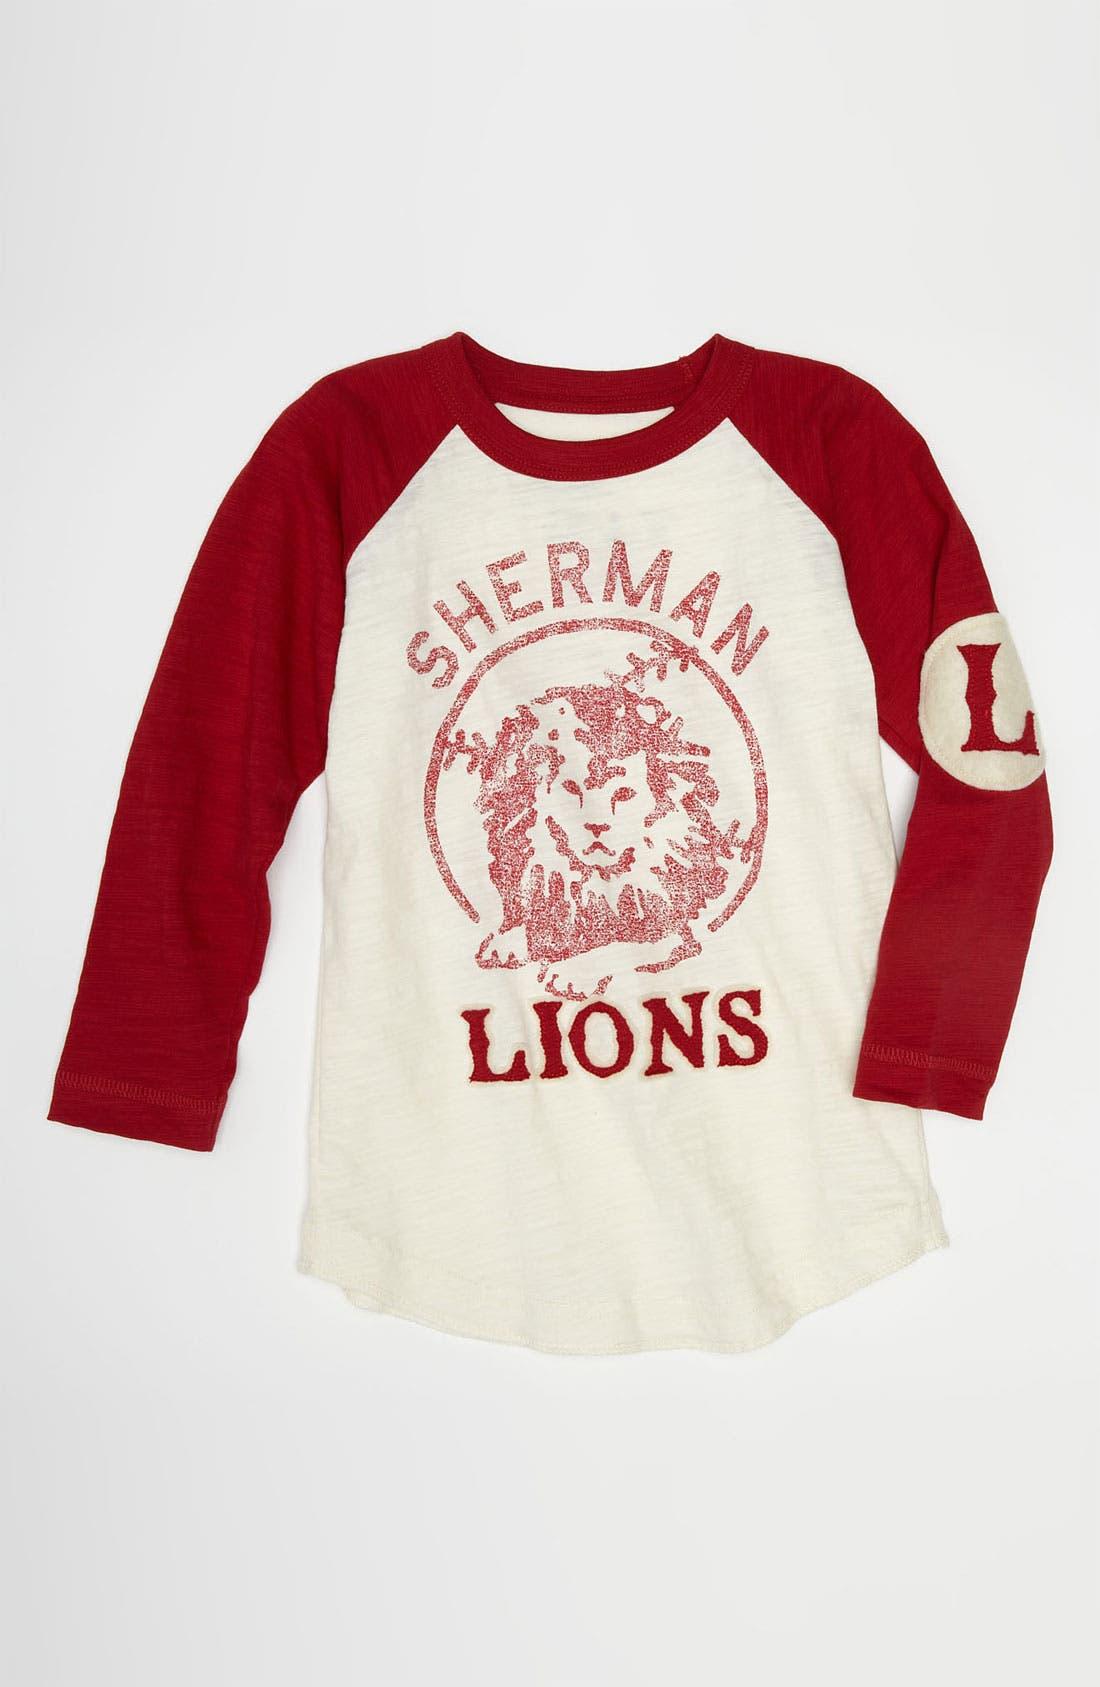 Alternate Image 1 Selected - Peek 'Sherman Lions' T-Shirt (Toddler, Little Boys & Big Boys)